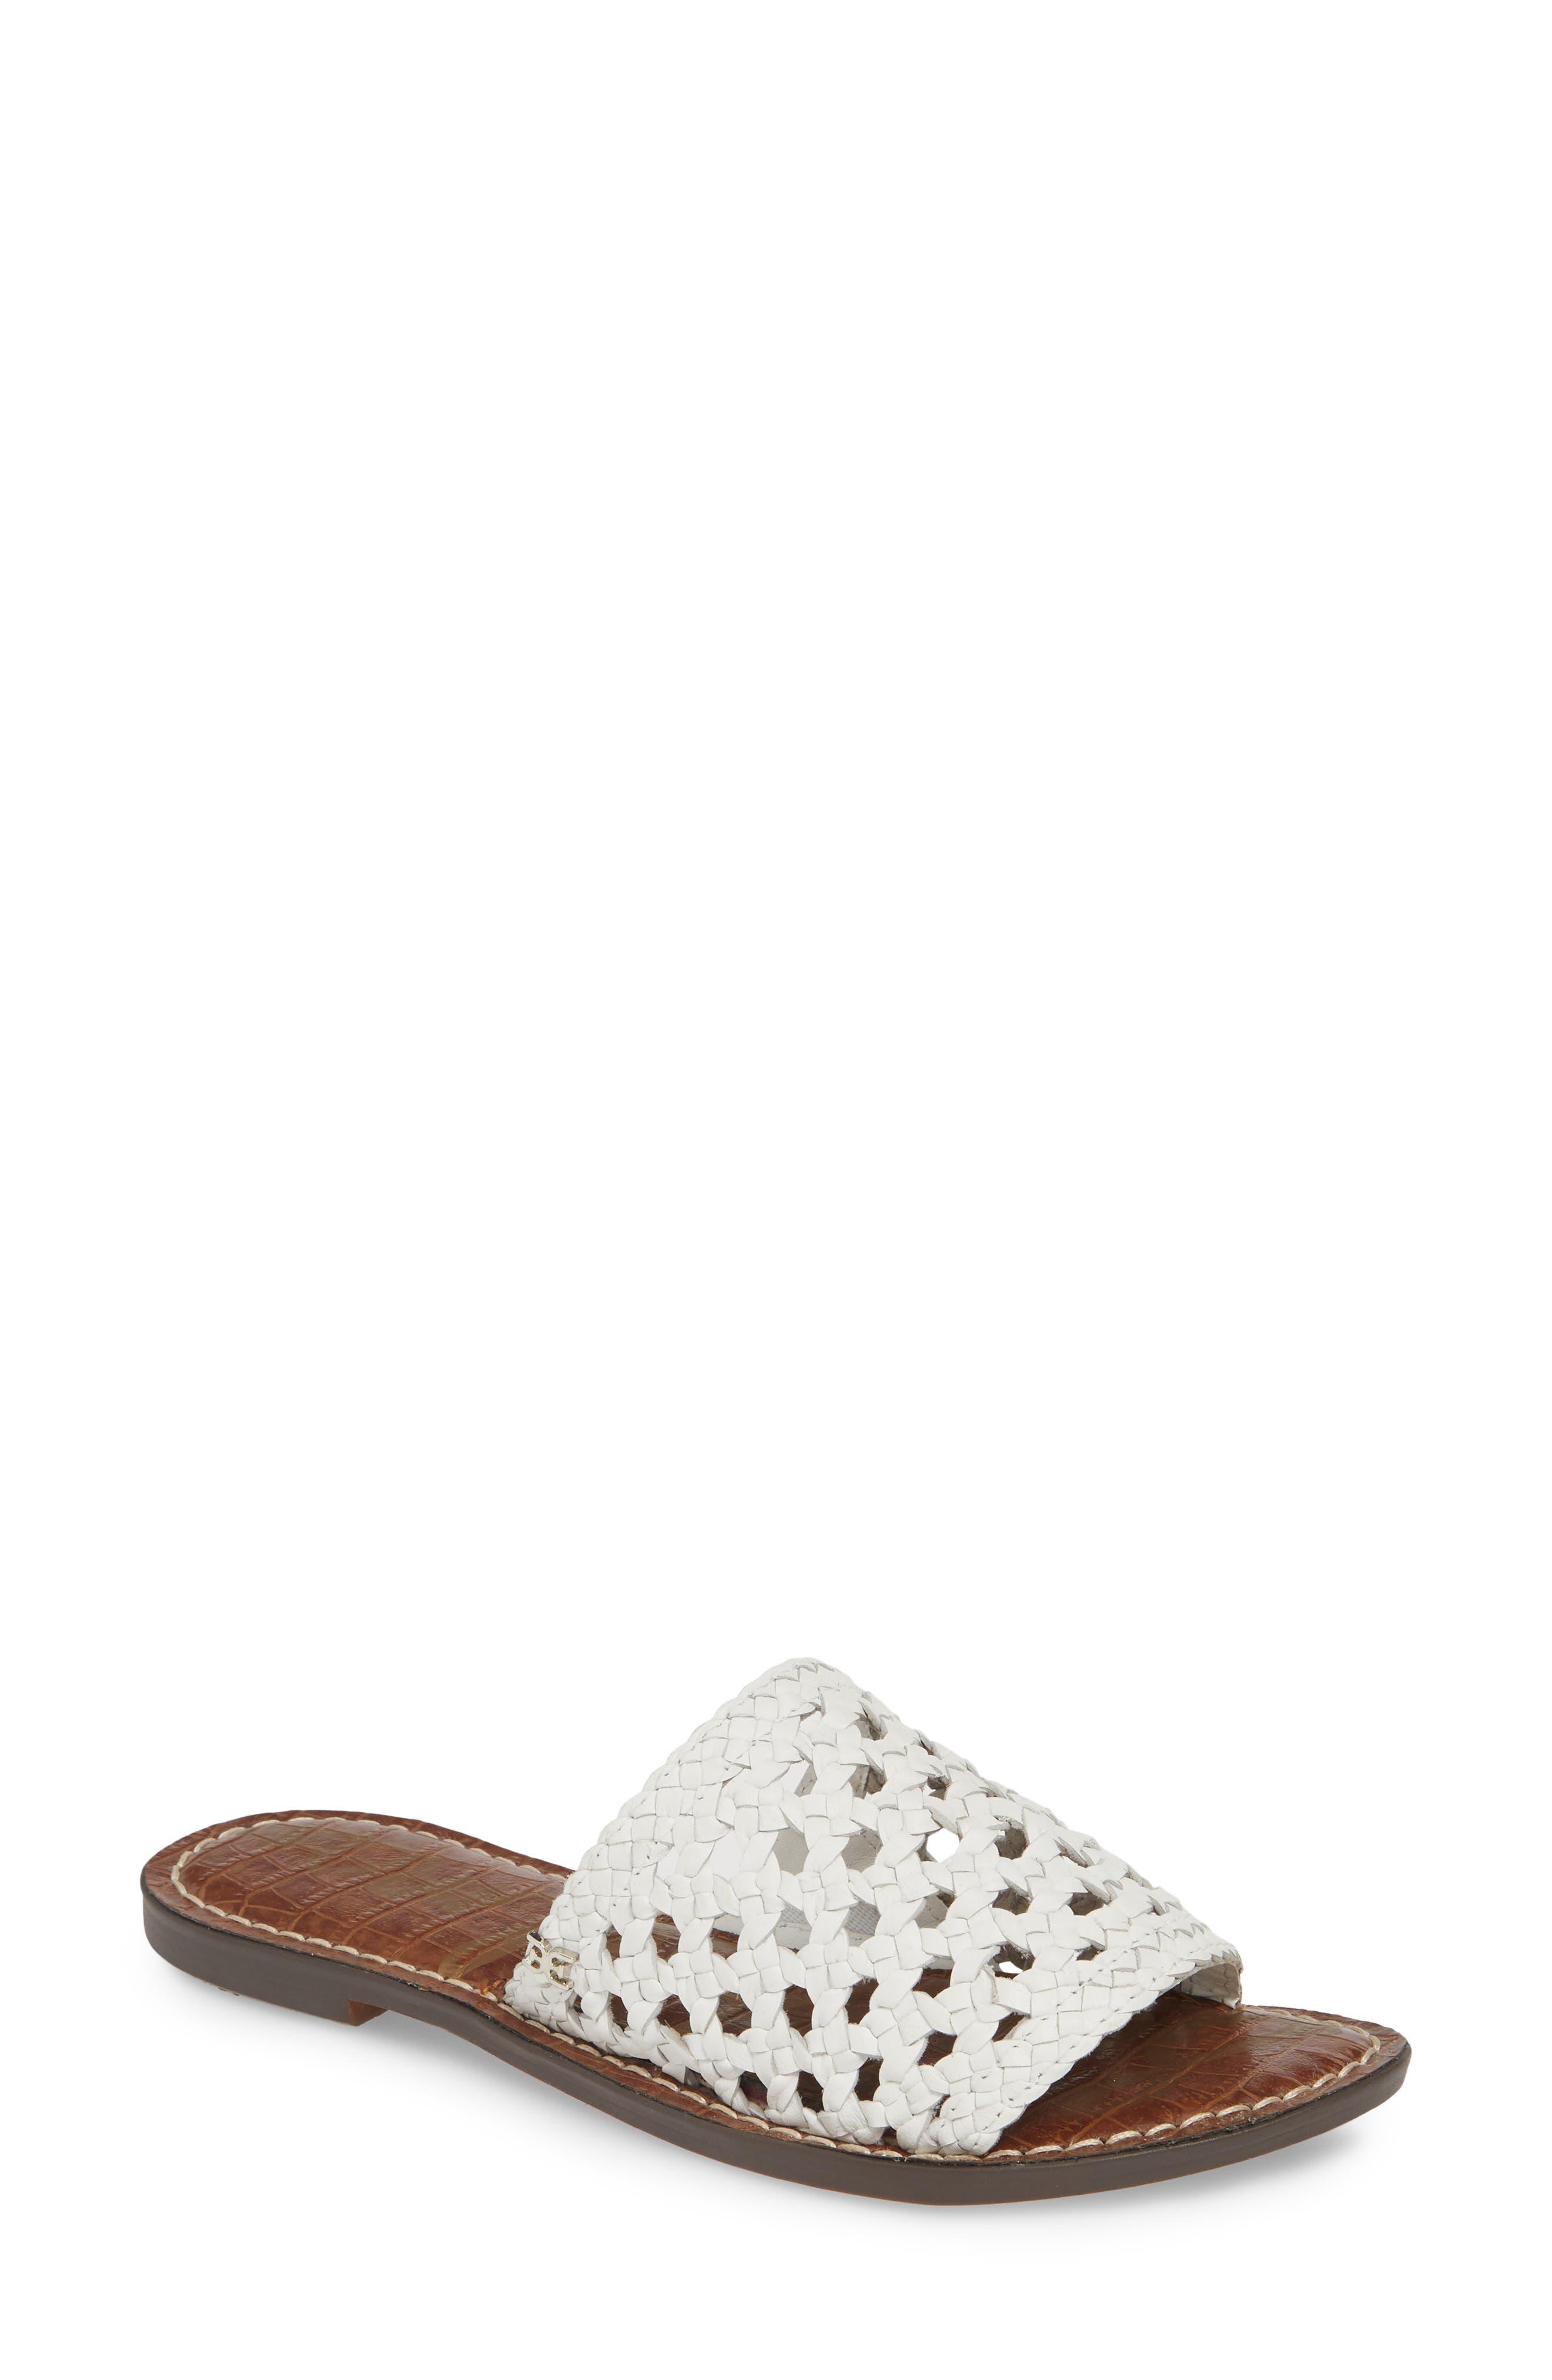 Sam Edelman Genovia Woven Slide Sandal, White